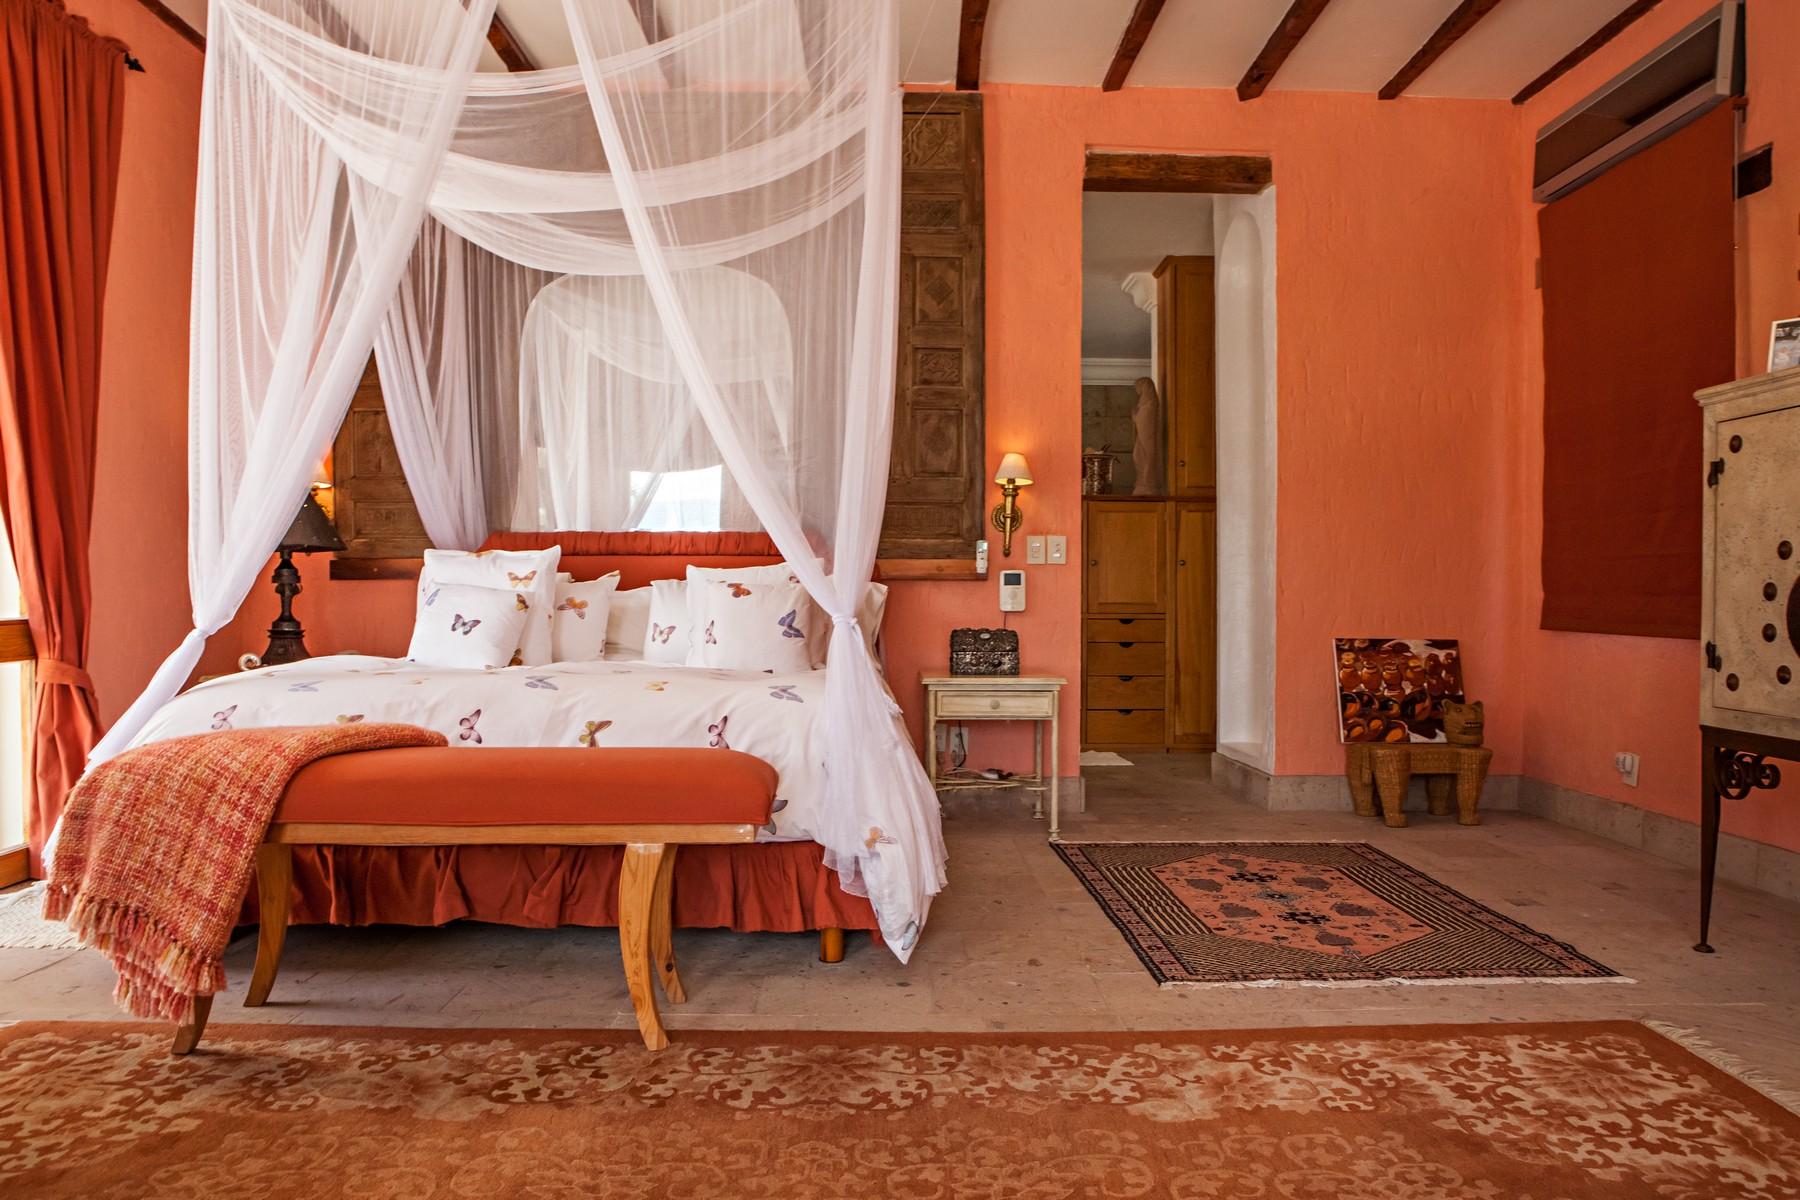 Additional photo for property listing at Lakefront Tuscan Villa, Ajijic, Lake Chapala  Ajijic, Jalisco 45920 Mexico